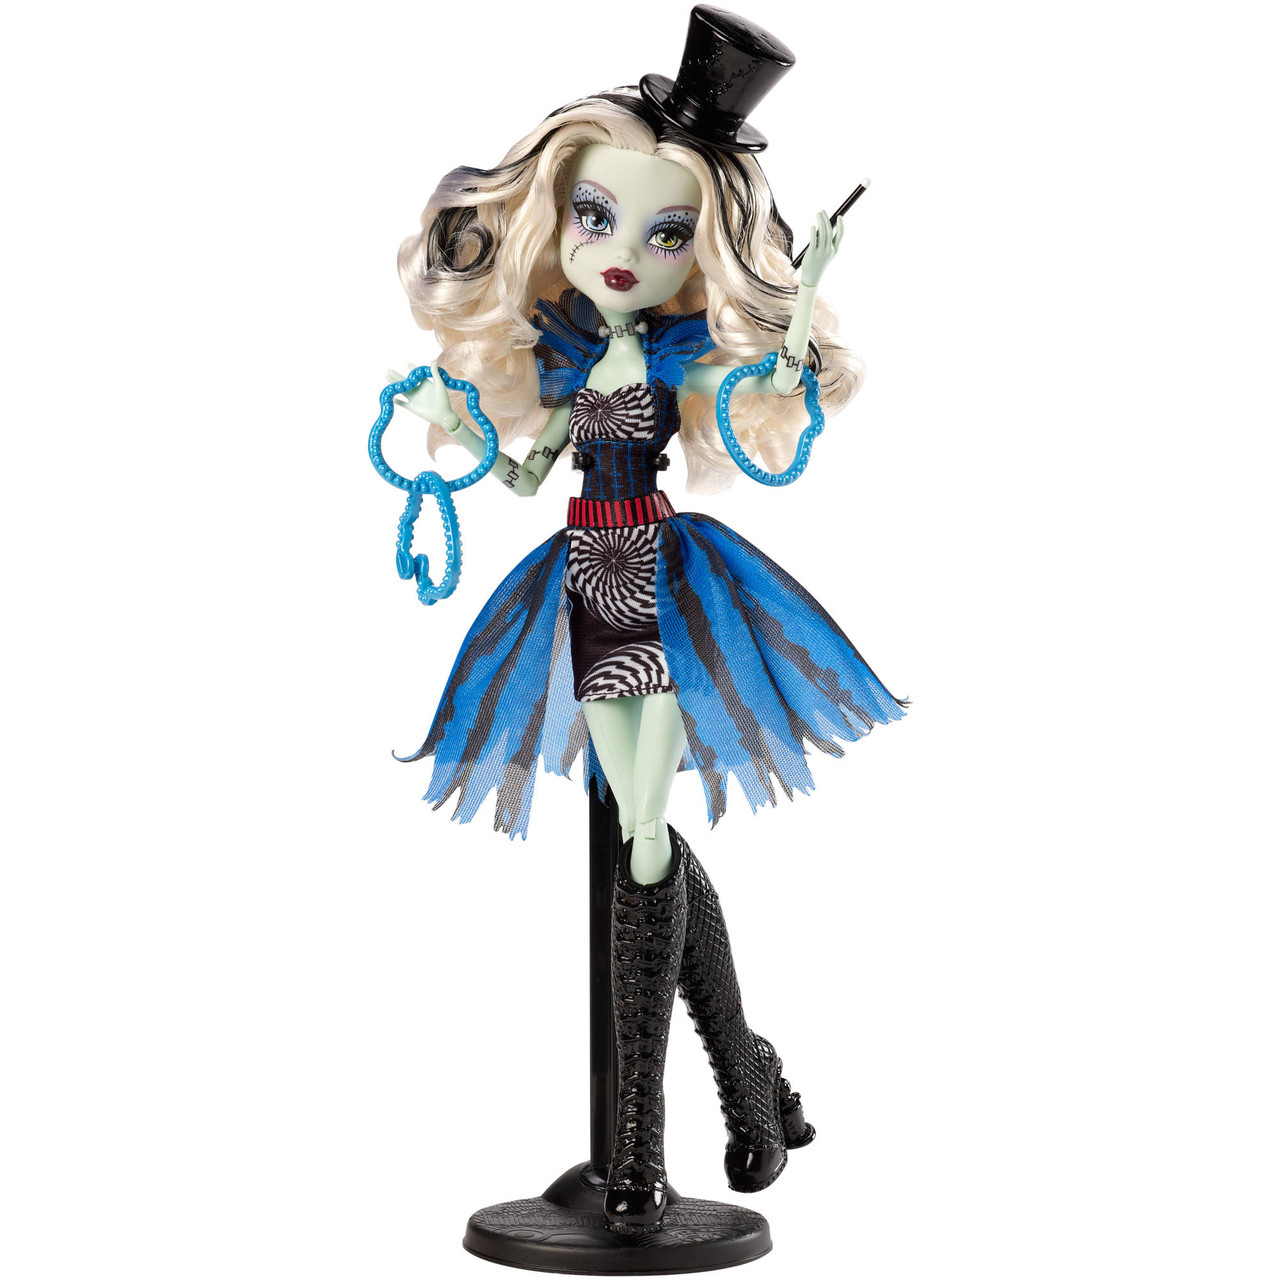 Кукла Монстер Хай Френки штейн Цирковое представление Monster High Freak du Chic Frankie Stein фрик ду чик шик